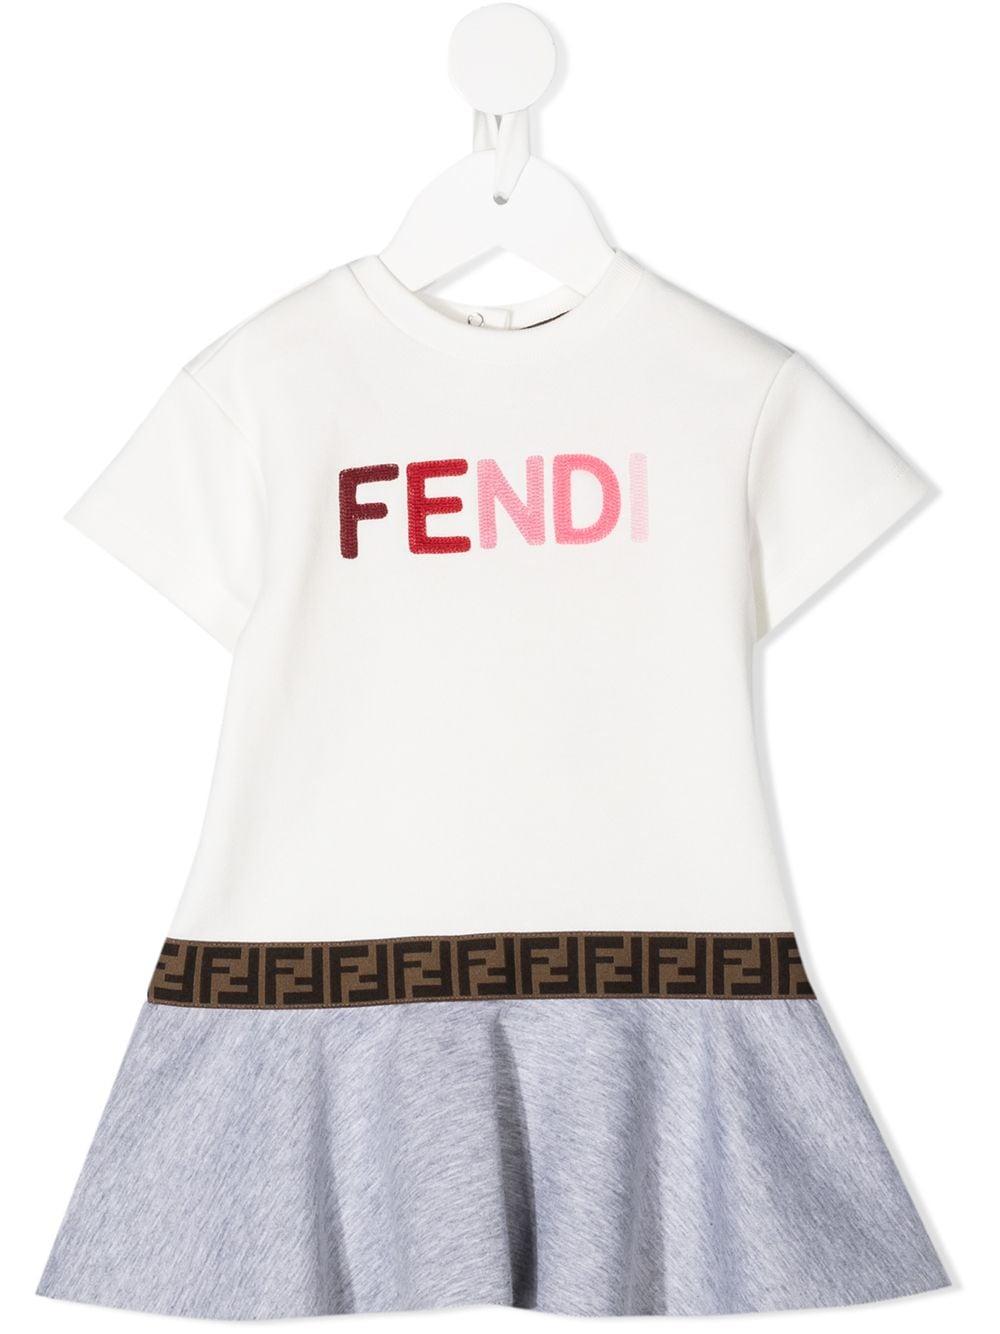 Fendi Kids Logo Tape Flared Dress Farfetch In 2021 Fendi Kids Designer Baby Clothes Luxury Baby Fashion [ 1334 x 1000 Pixel ]